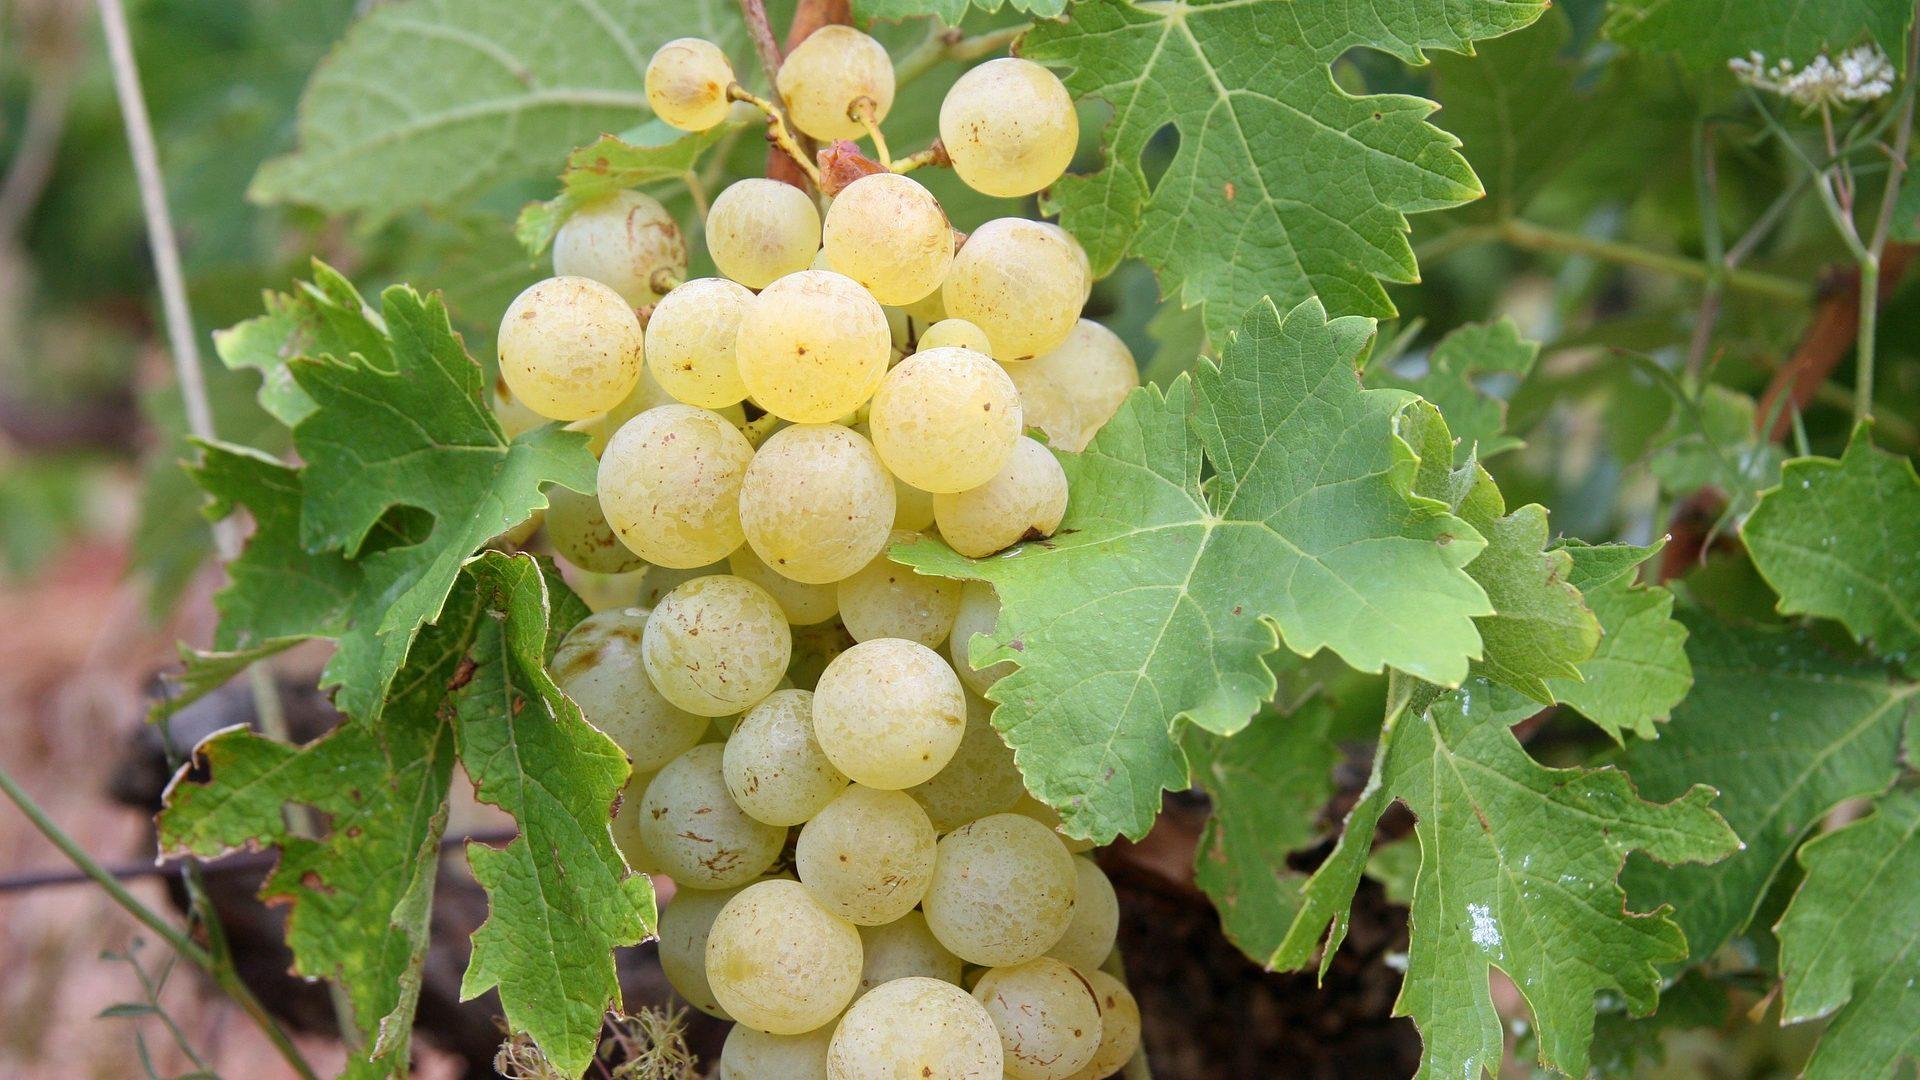 grapes-522009_1920